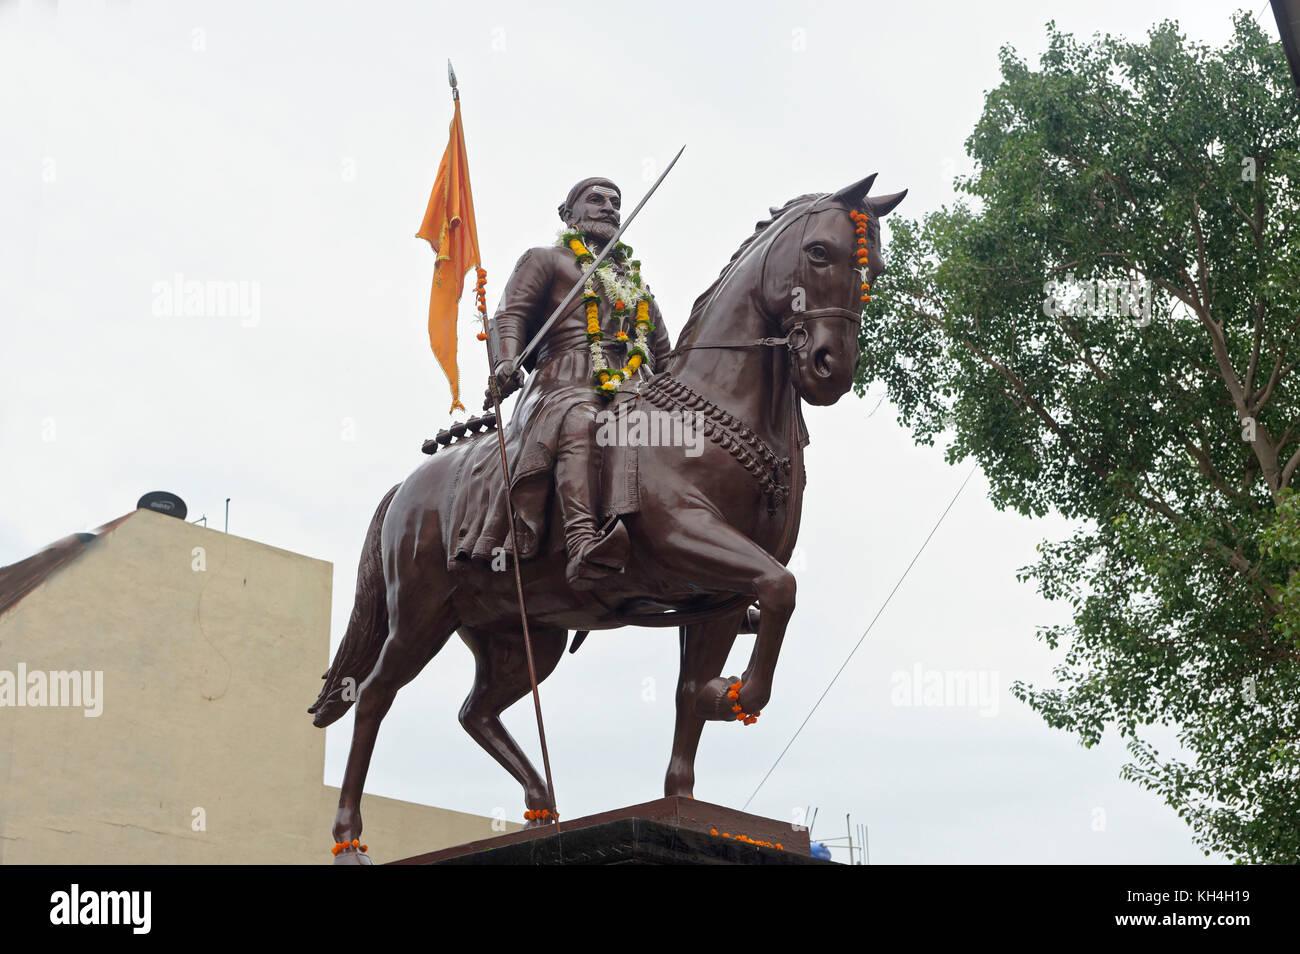 Shivaji Maharaj Statuen, miraj, Maharashtra, Indien, Asien Stockbild